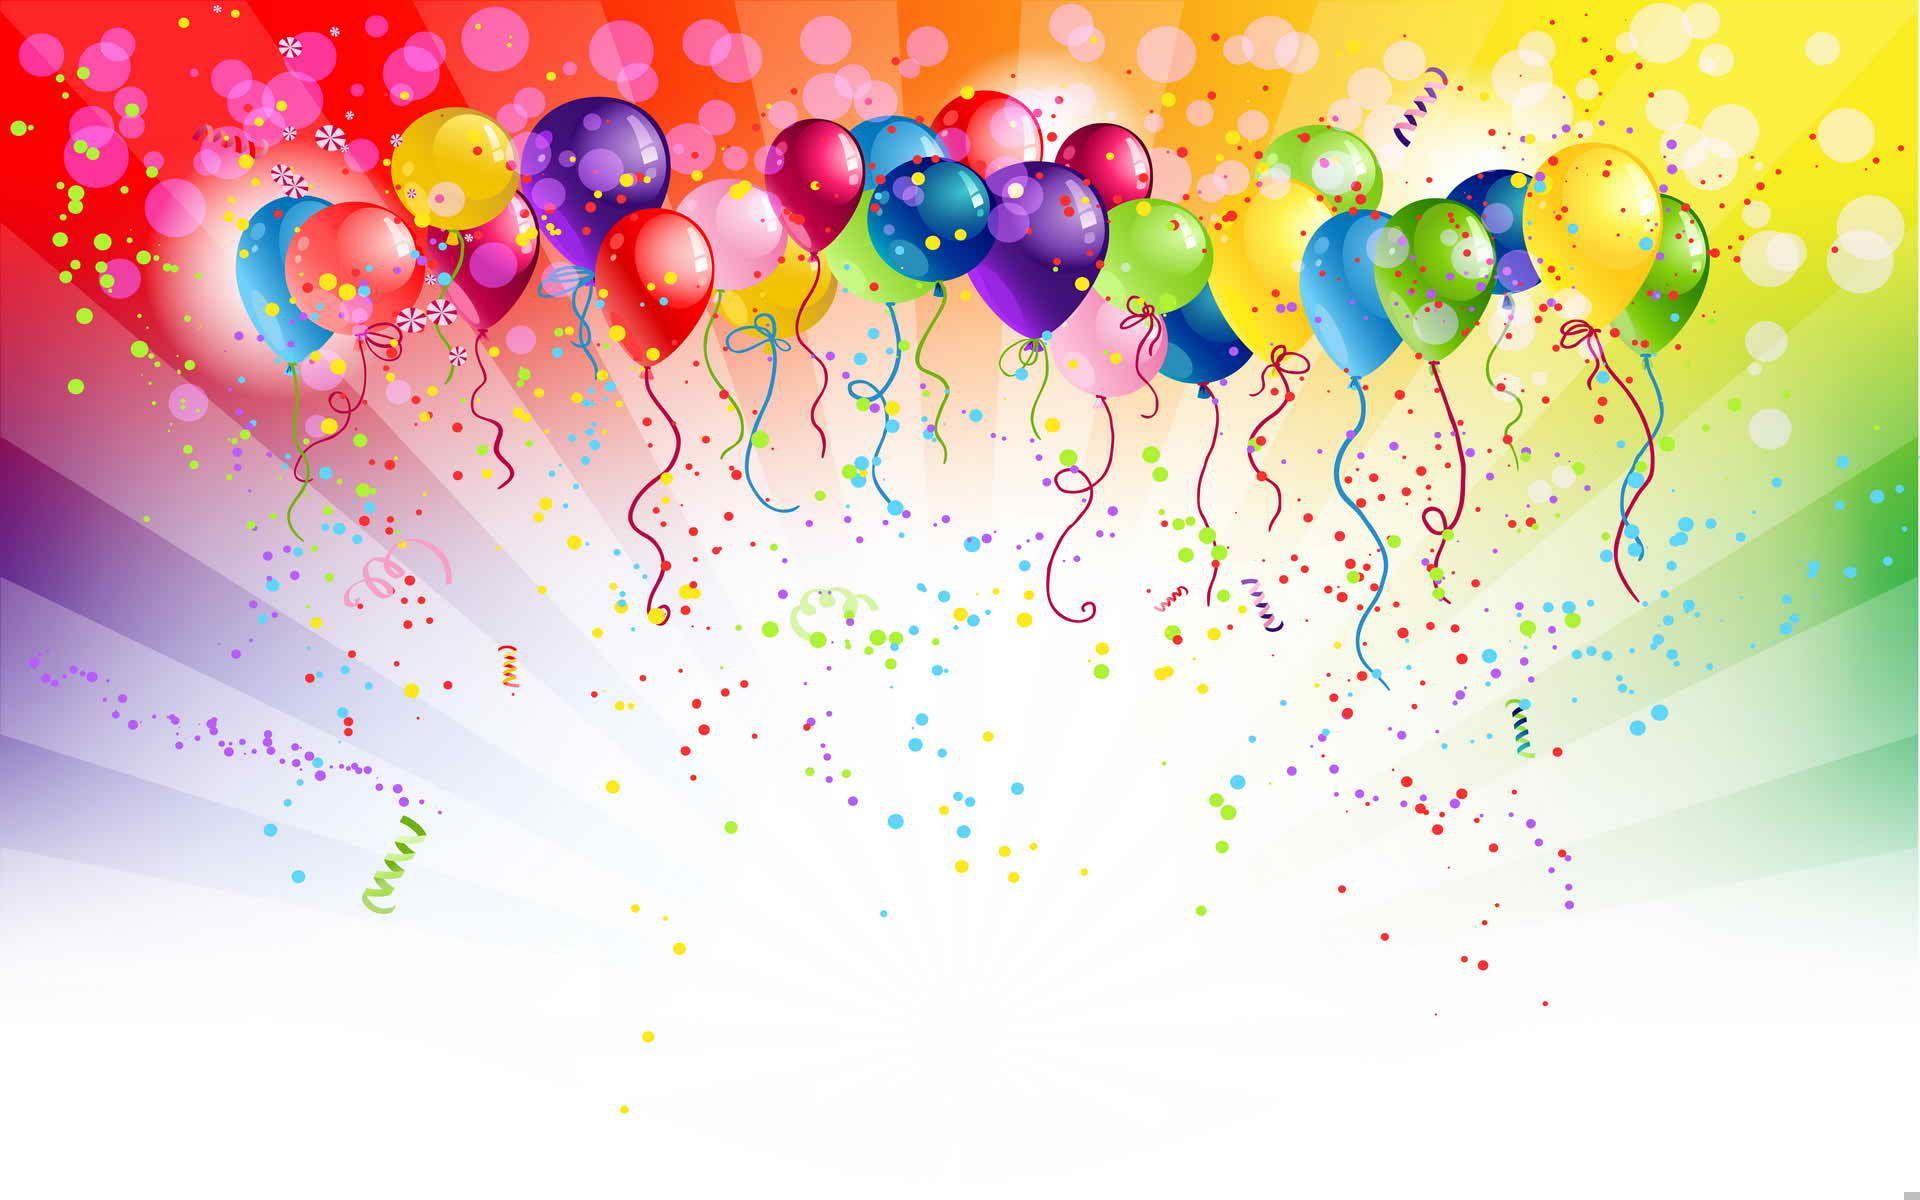 birthday background Google Search Happy birthday